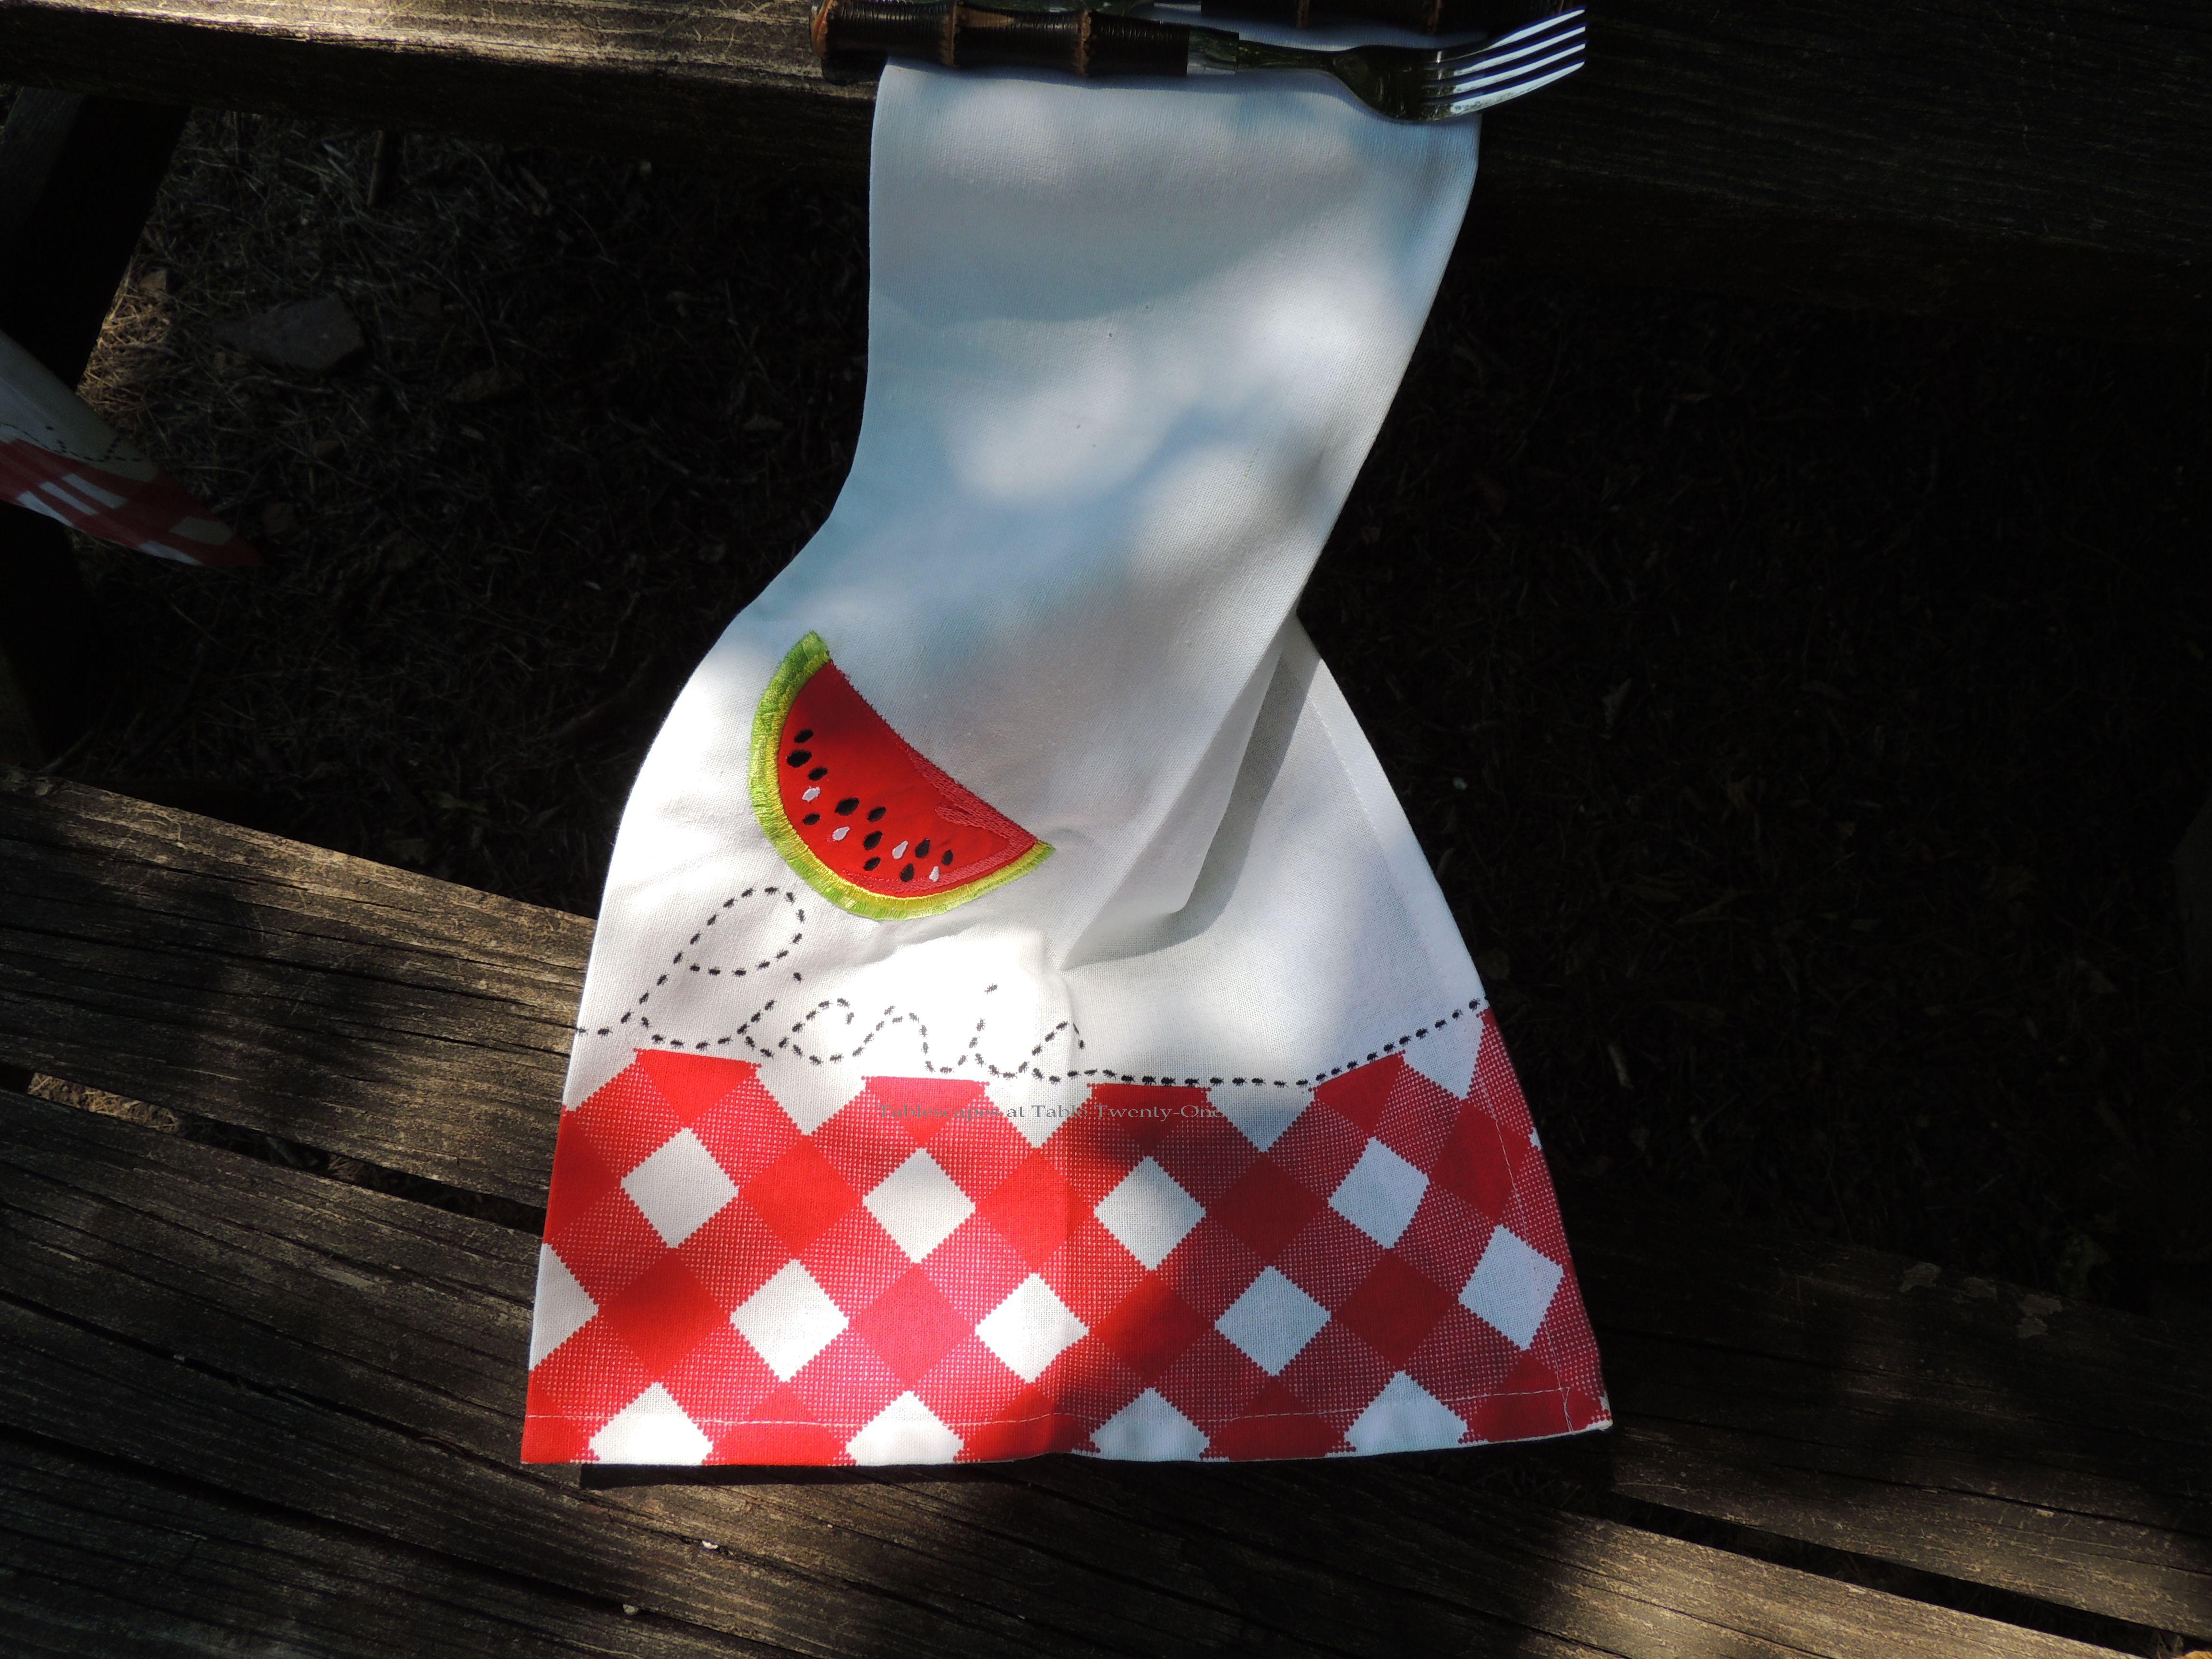 Tablescapes at Table Twenty-One, www.tabletwentyone.wordpress.com, Picnic Ants - Watermelon & ants picnic napkin